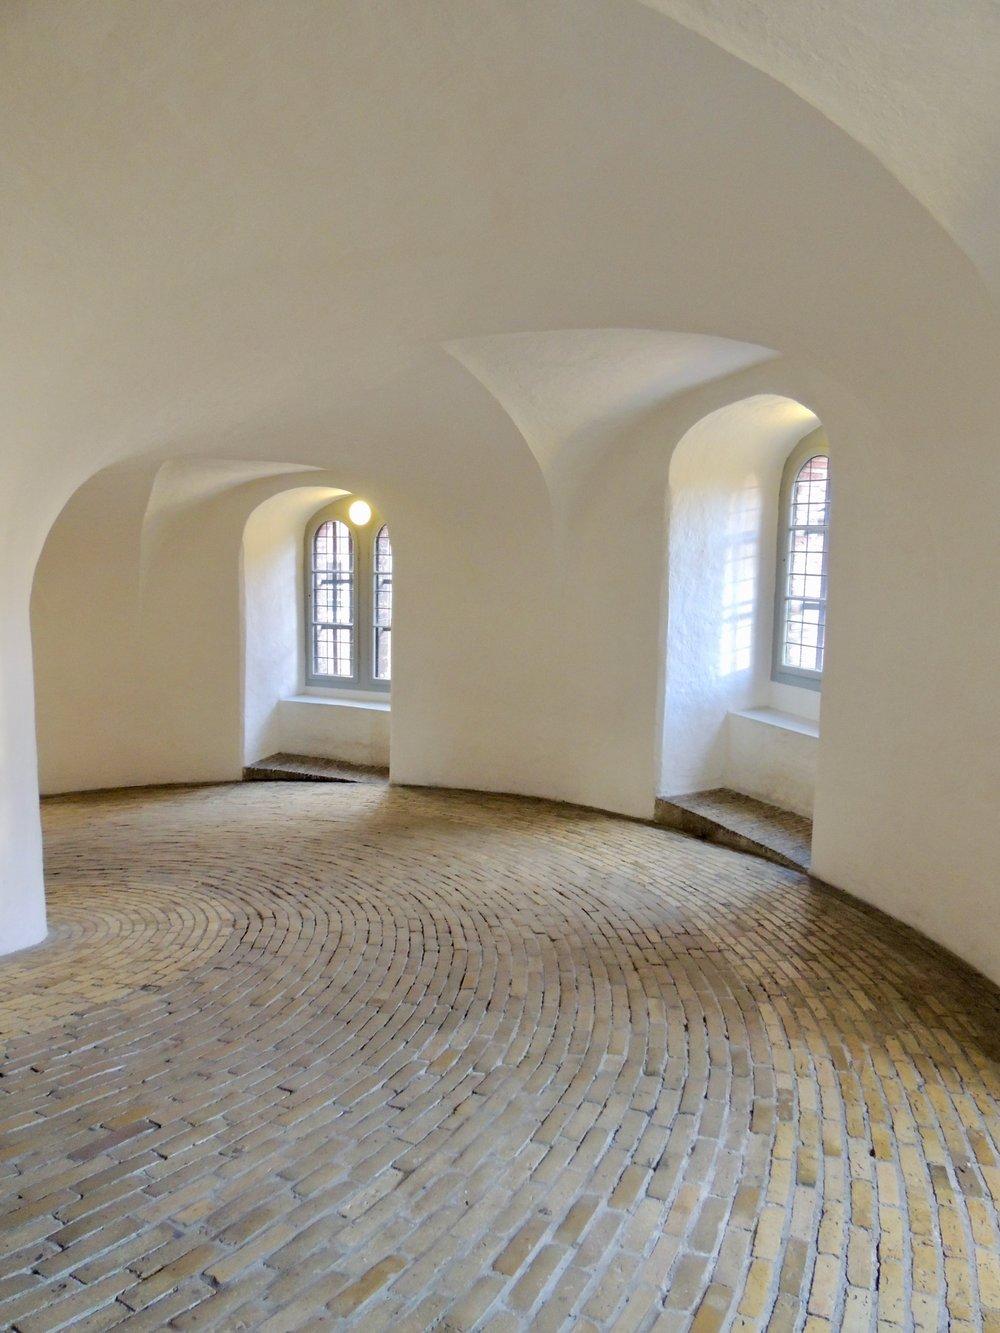 The spiraling walk way of the Rundetaarn